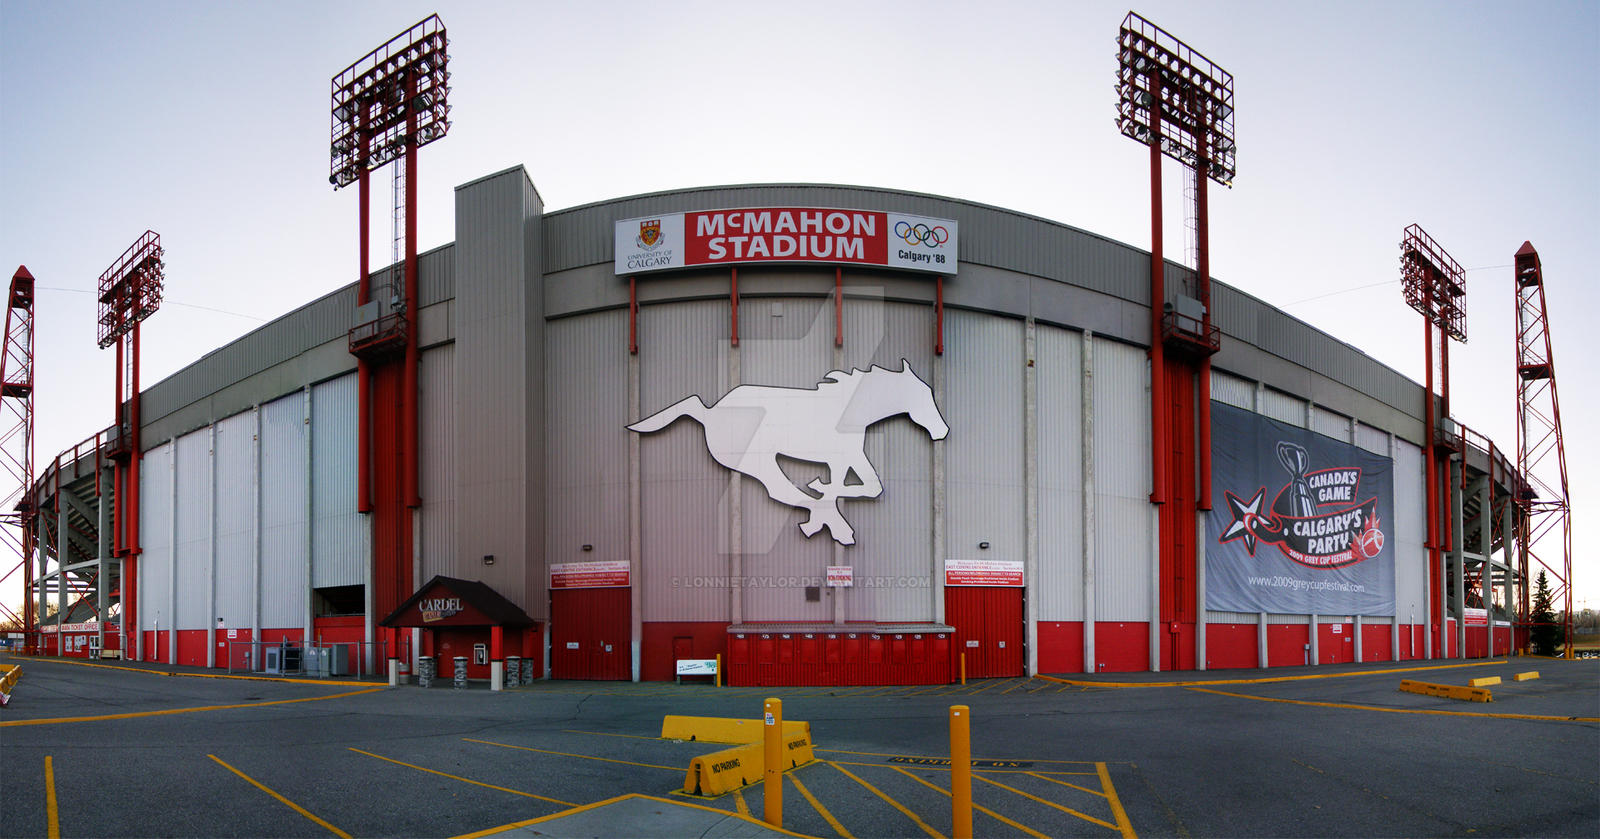 McMahon Stadium Calgary by lonnietaylor